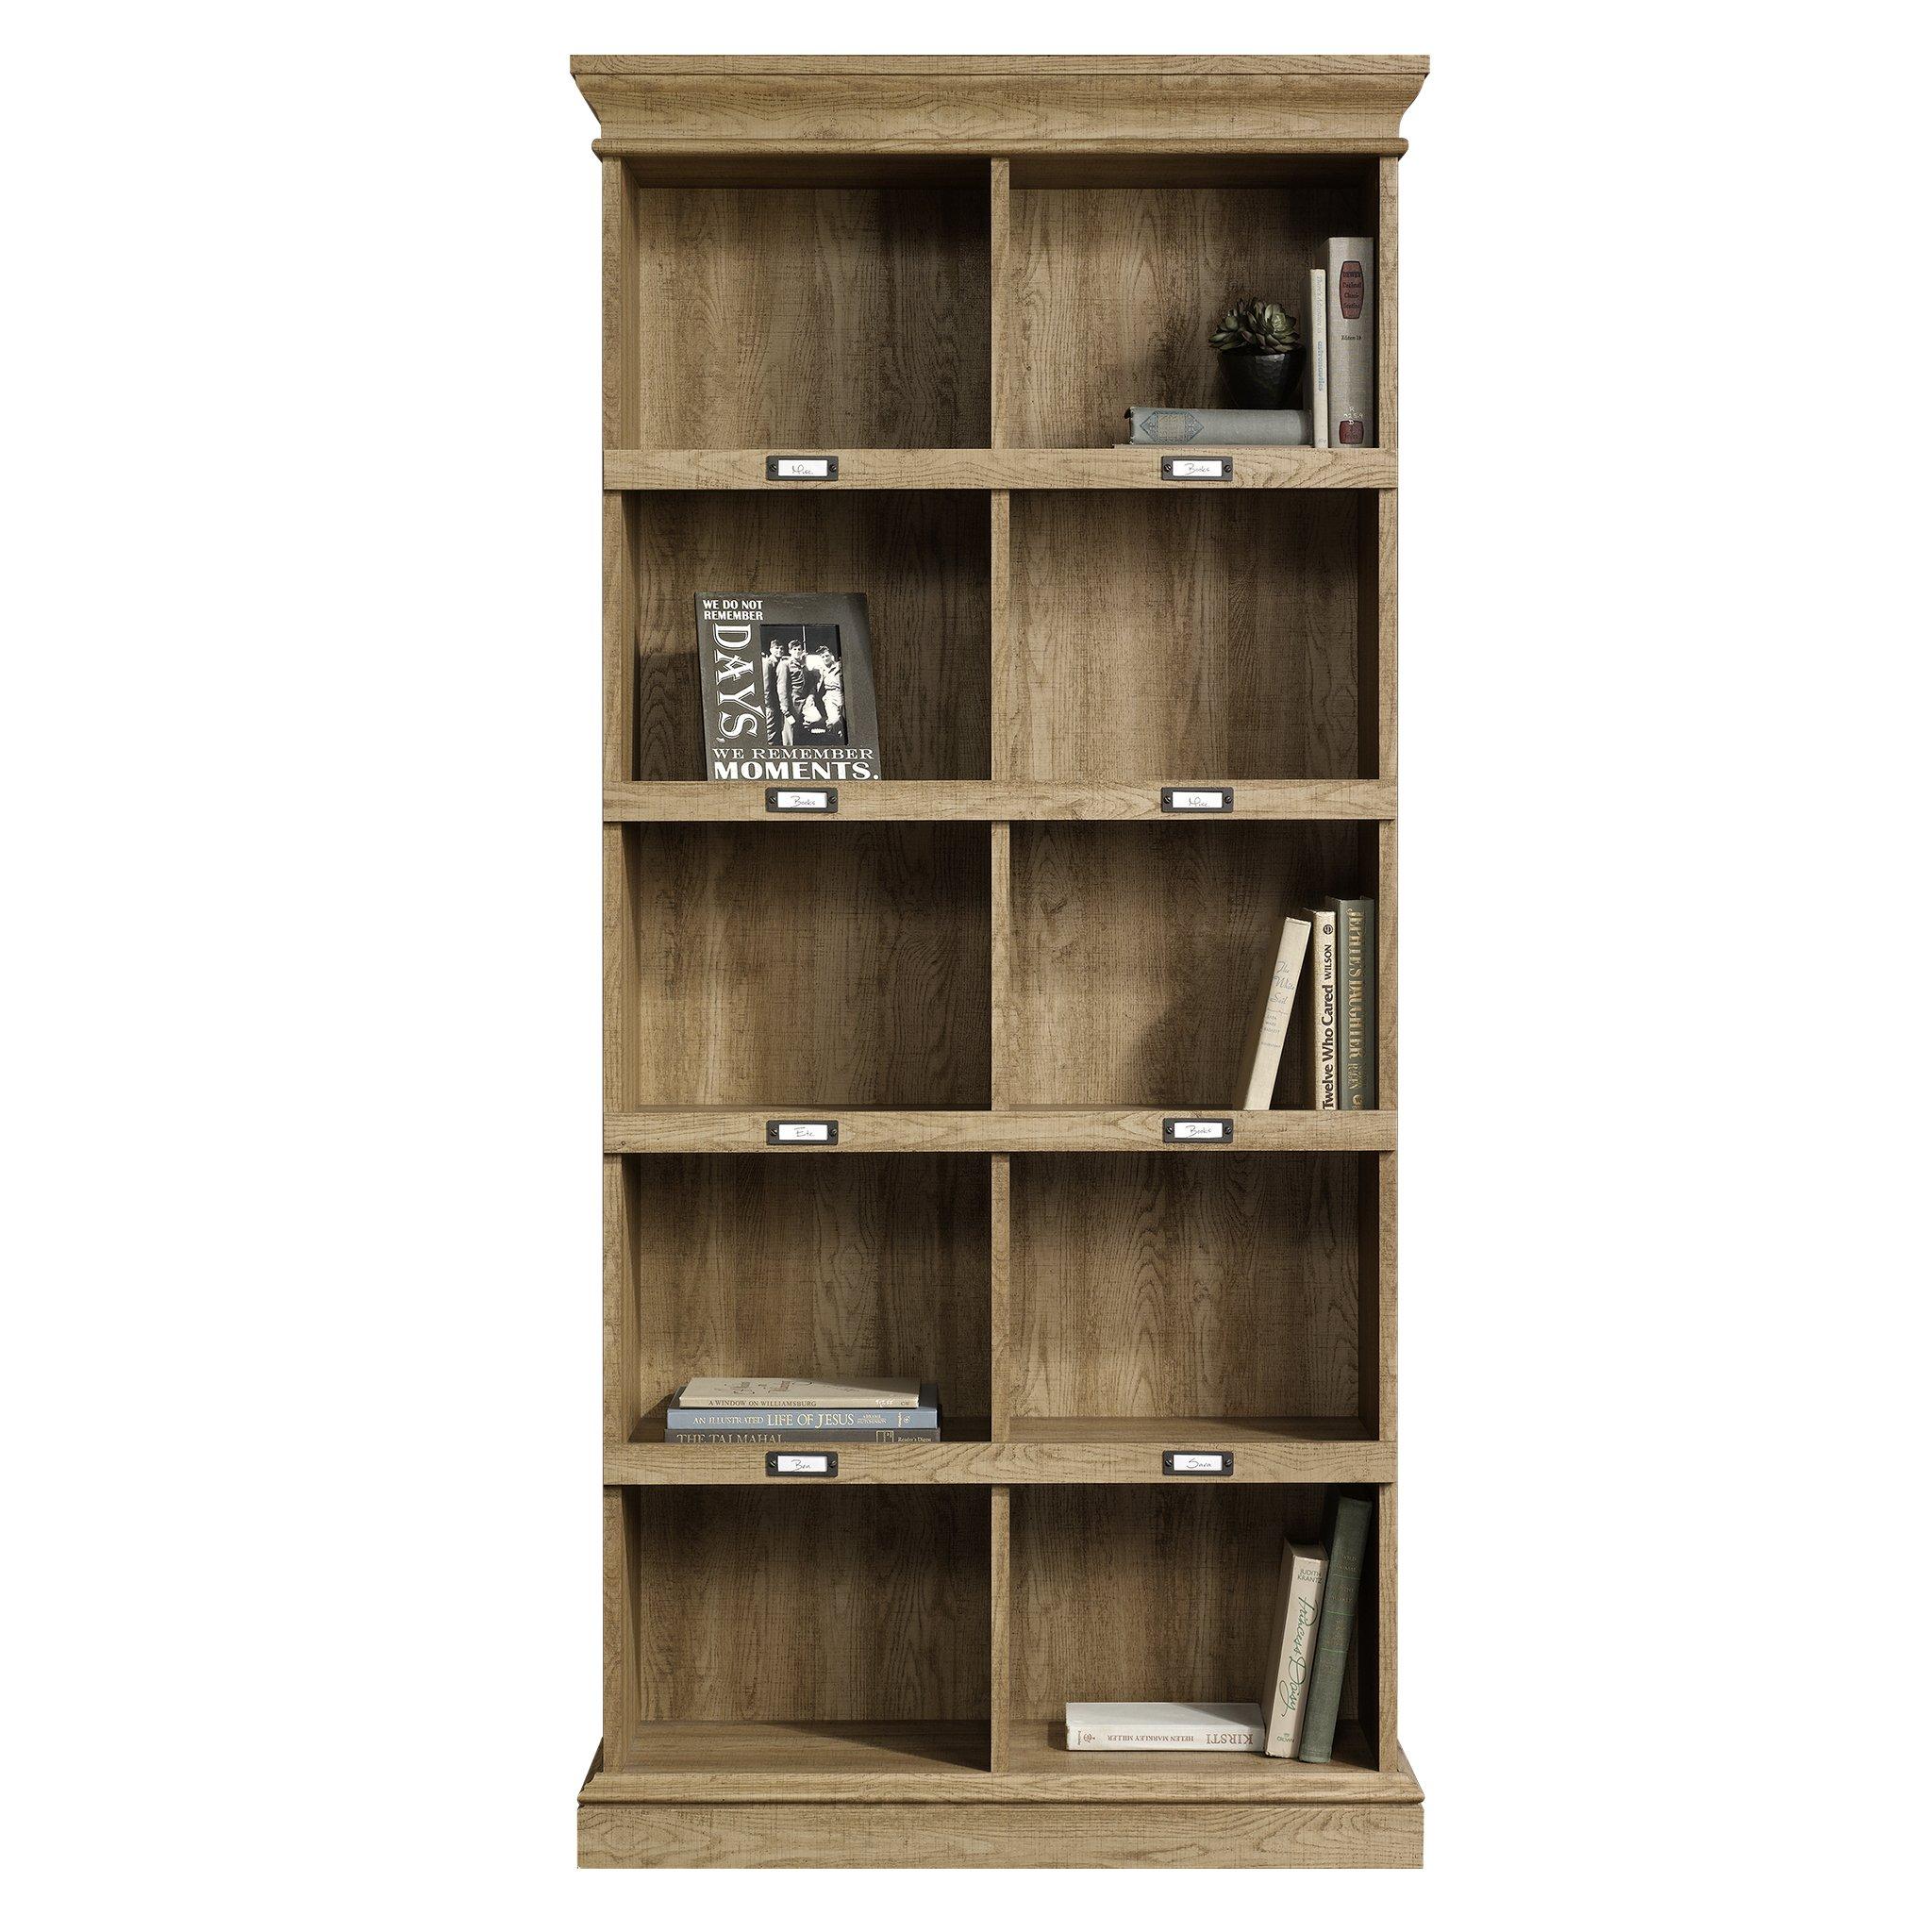 Sauder 414725 Barrister Lane Bookcase, L: 35.55'' x W: 13.50'' x H: 75.04'', Scribed Oak finish by Sauder (Image #3)